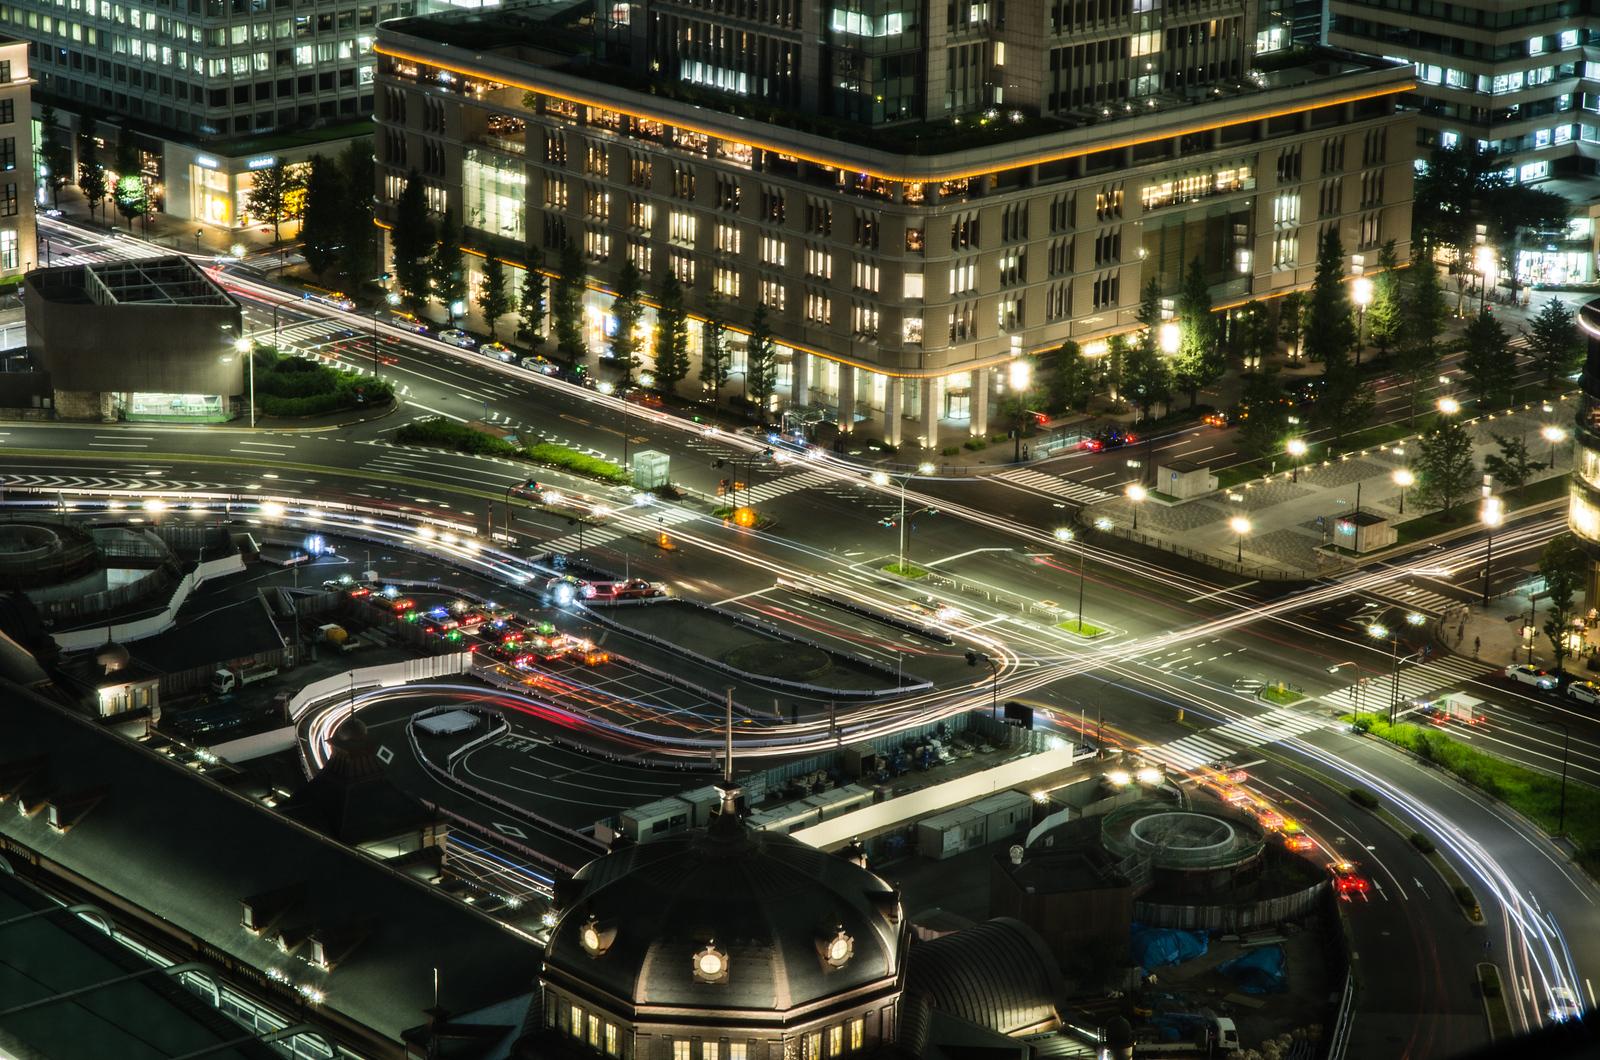 Station Traffic